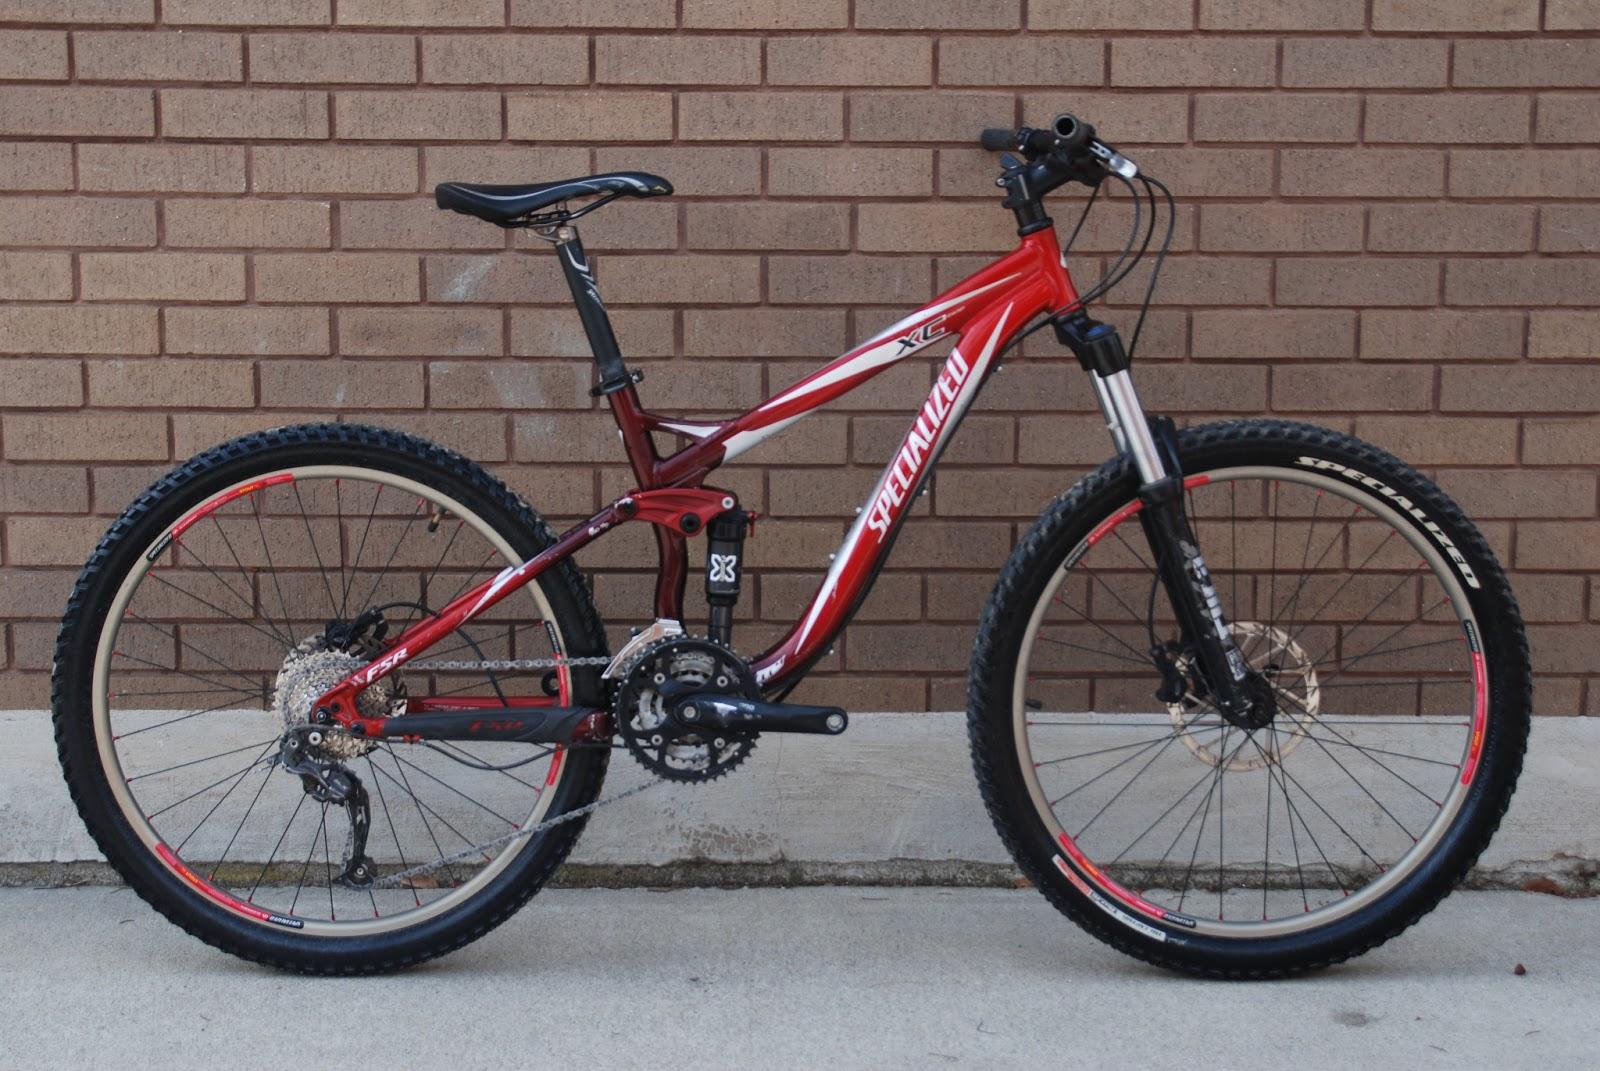 100+ Shimano Bicycle Specialized Fsr Xc – yasminroohi